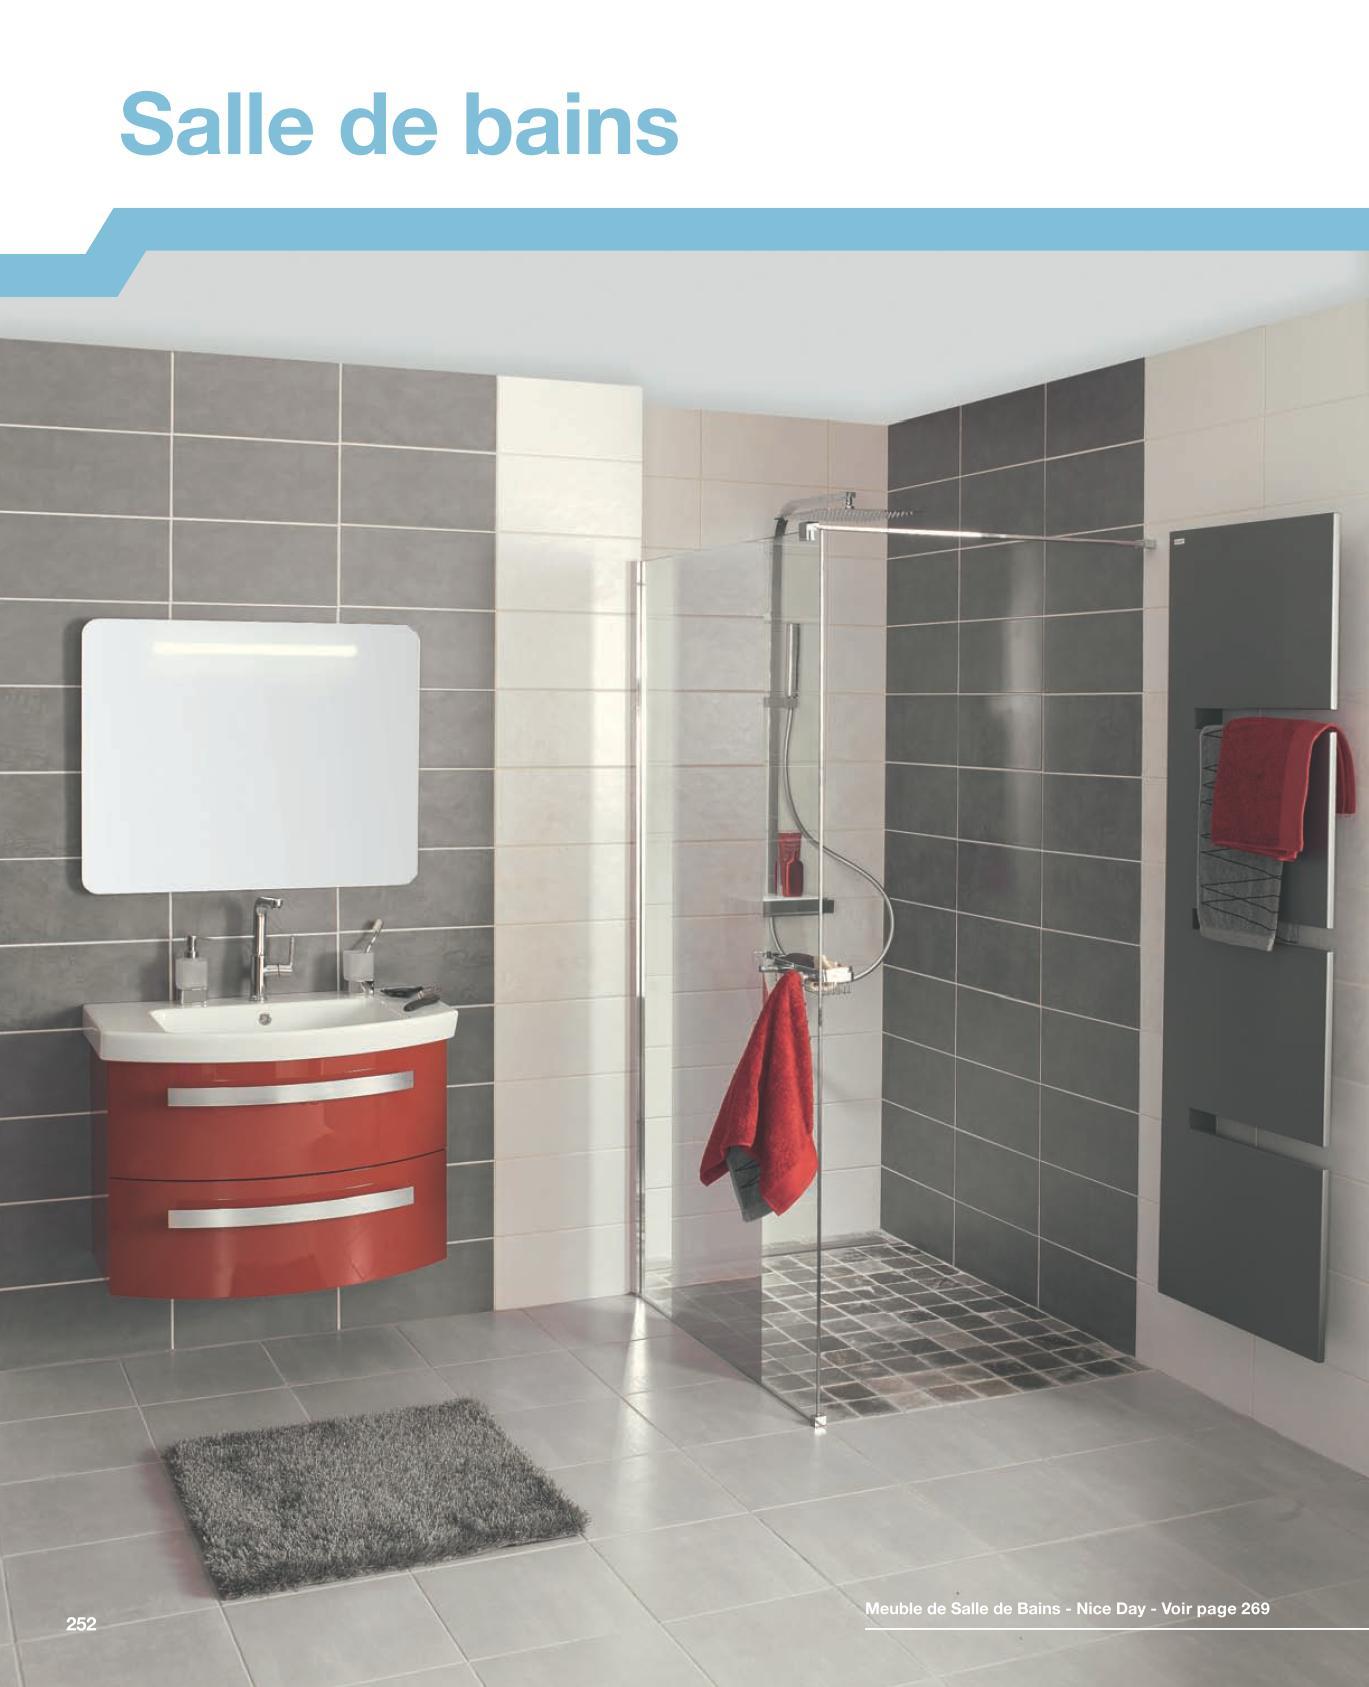 faience point p salle de bain. Black Bedroom Furniture Sets. Home Design Ideas